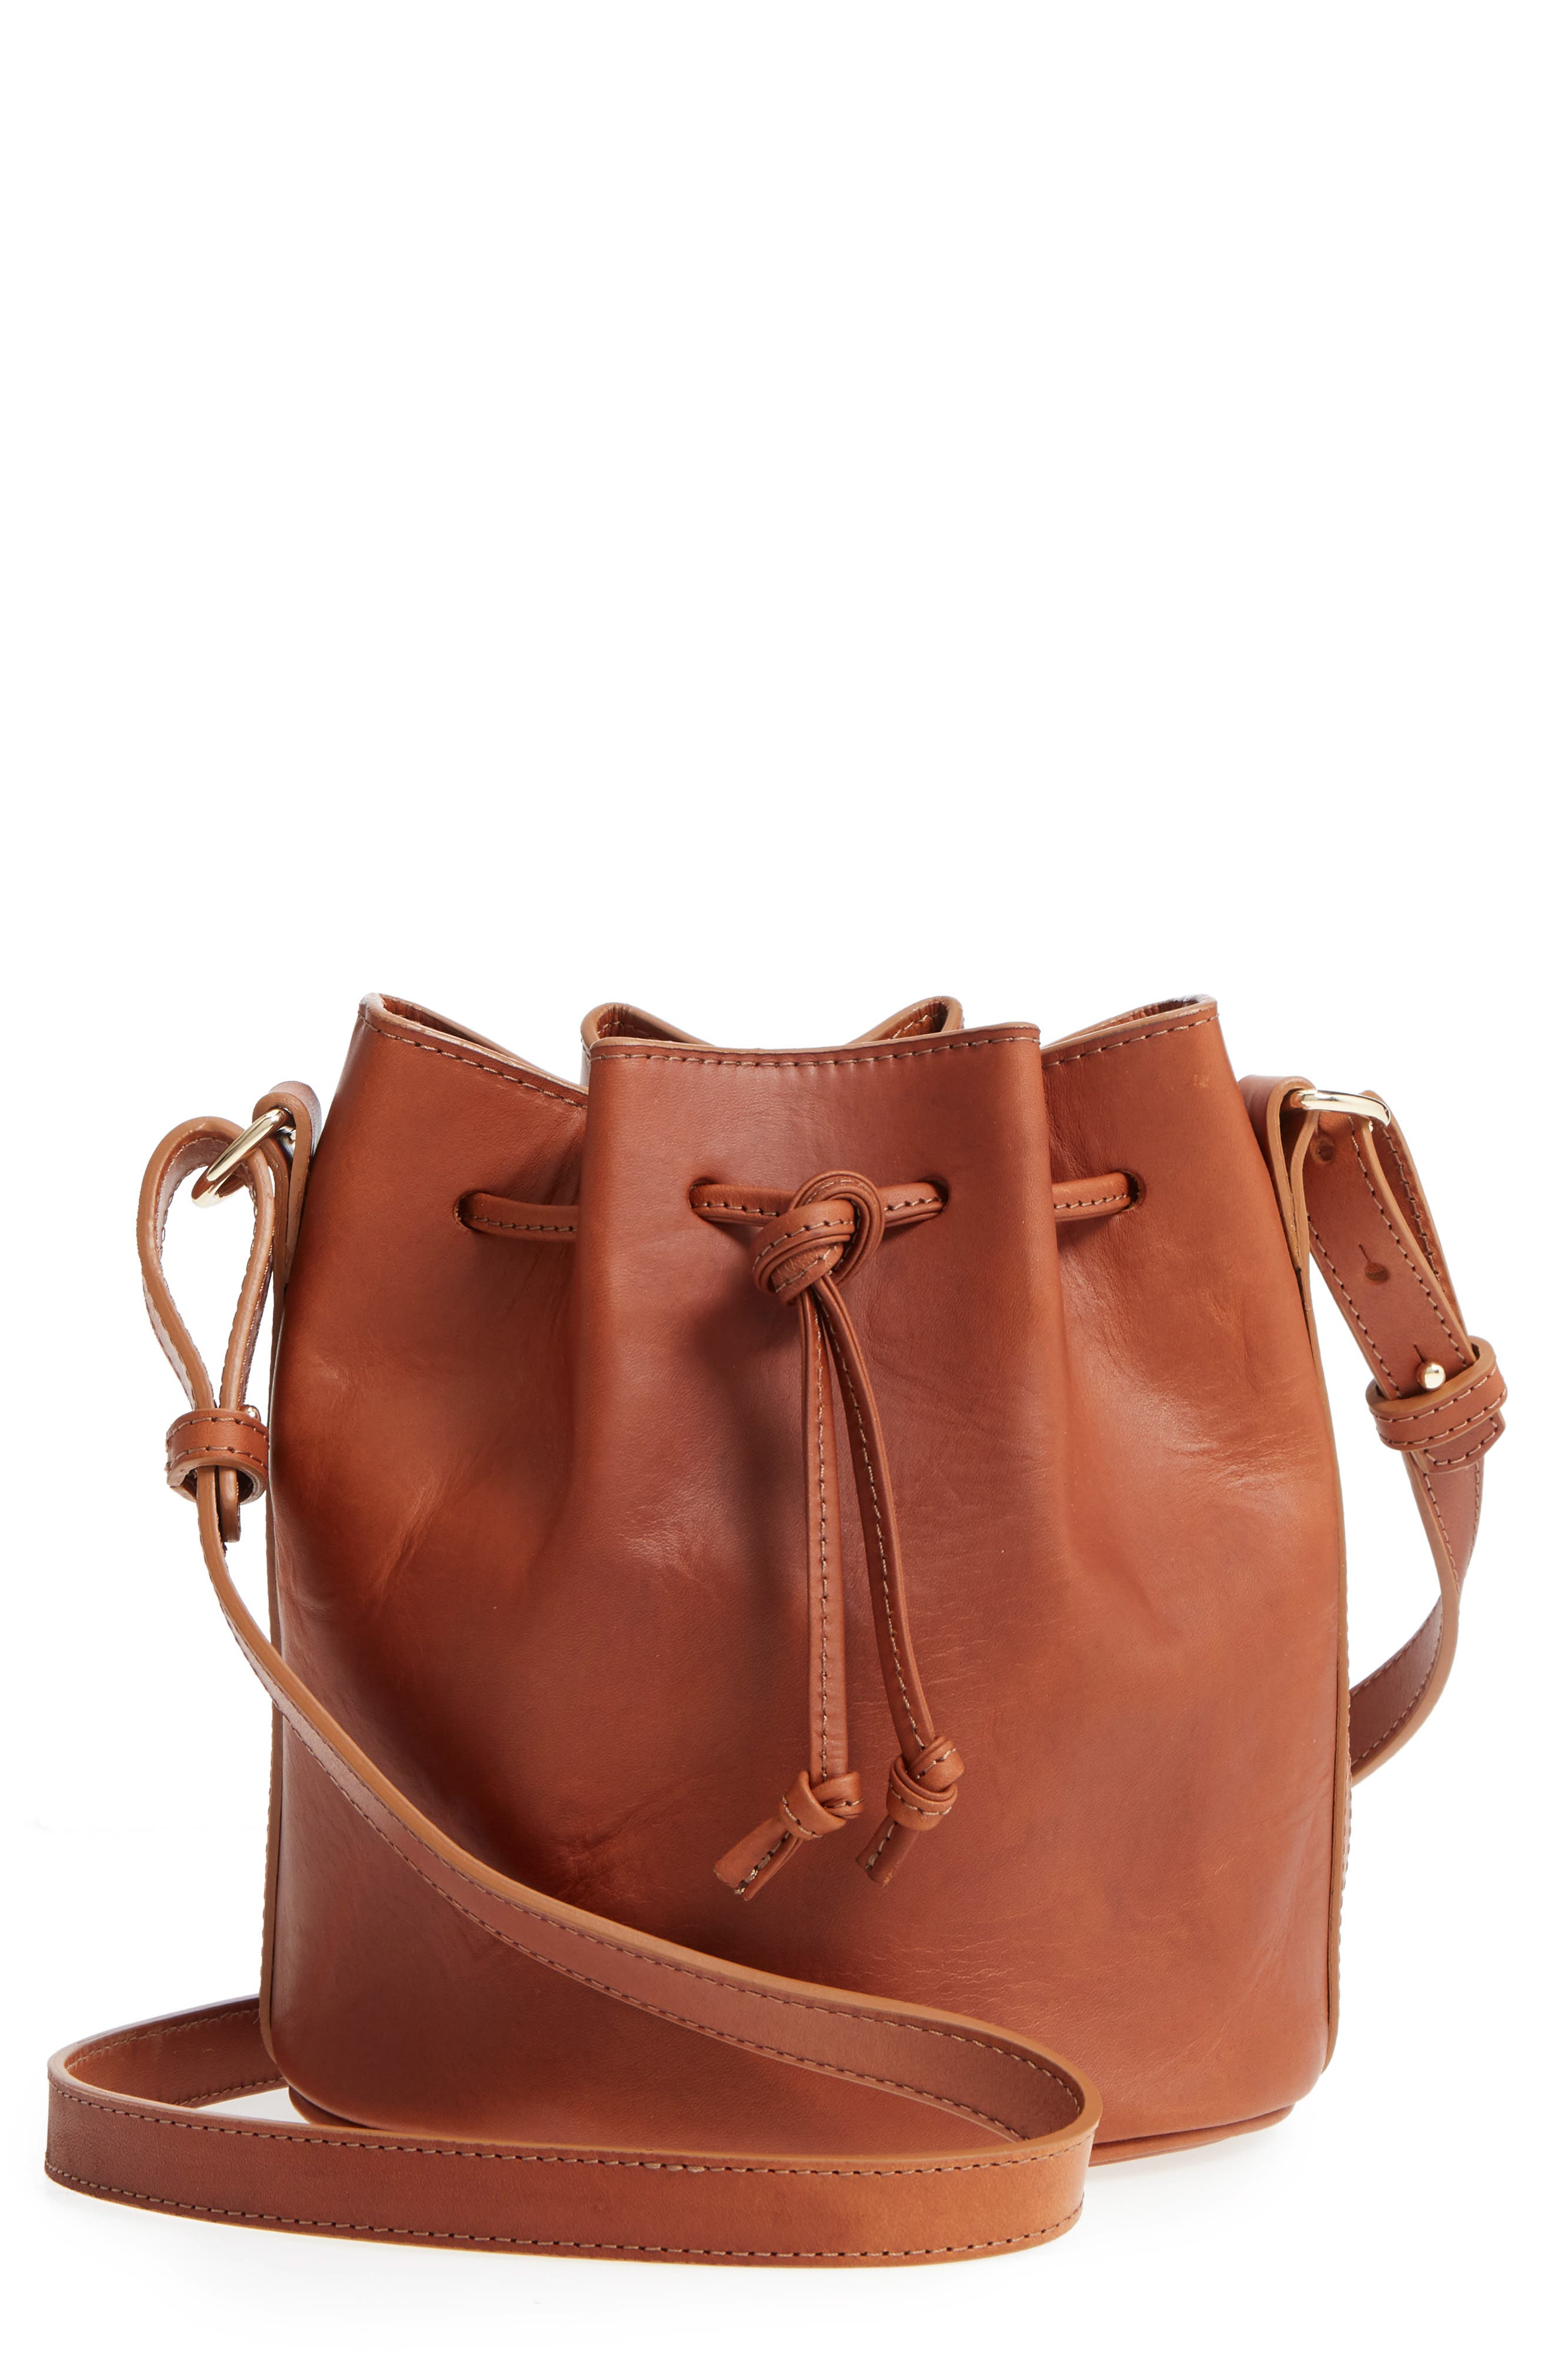 Sézane Mini Farrow Bucket Bag